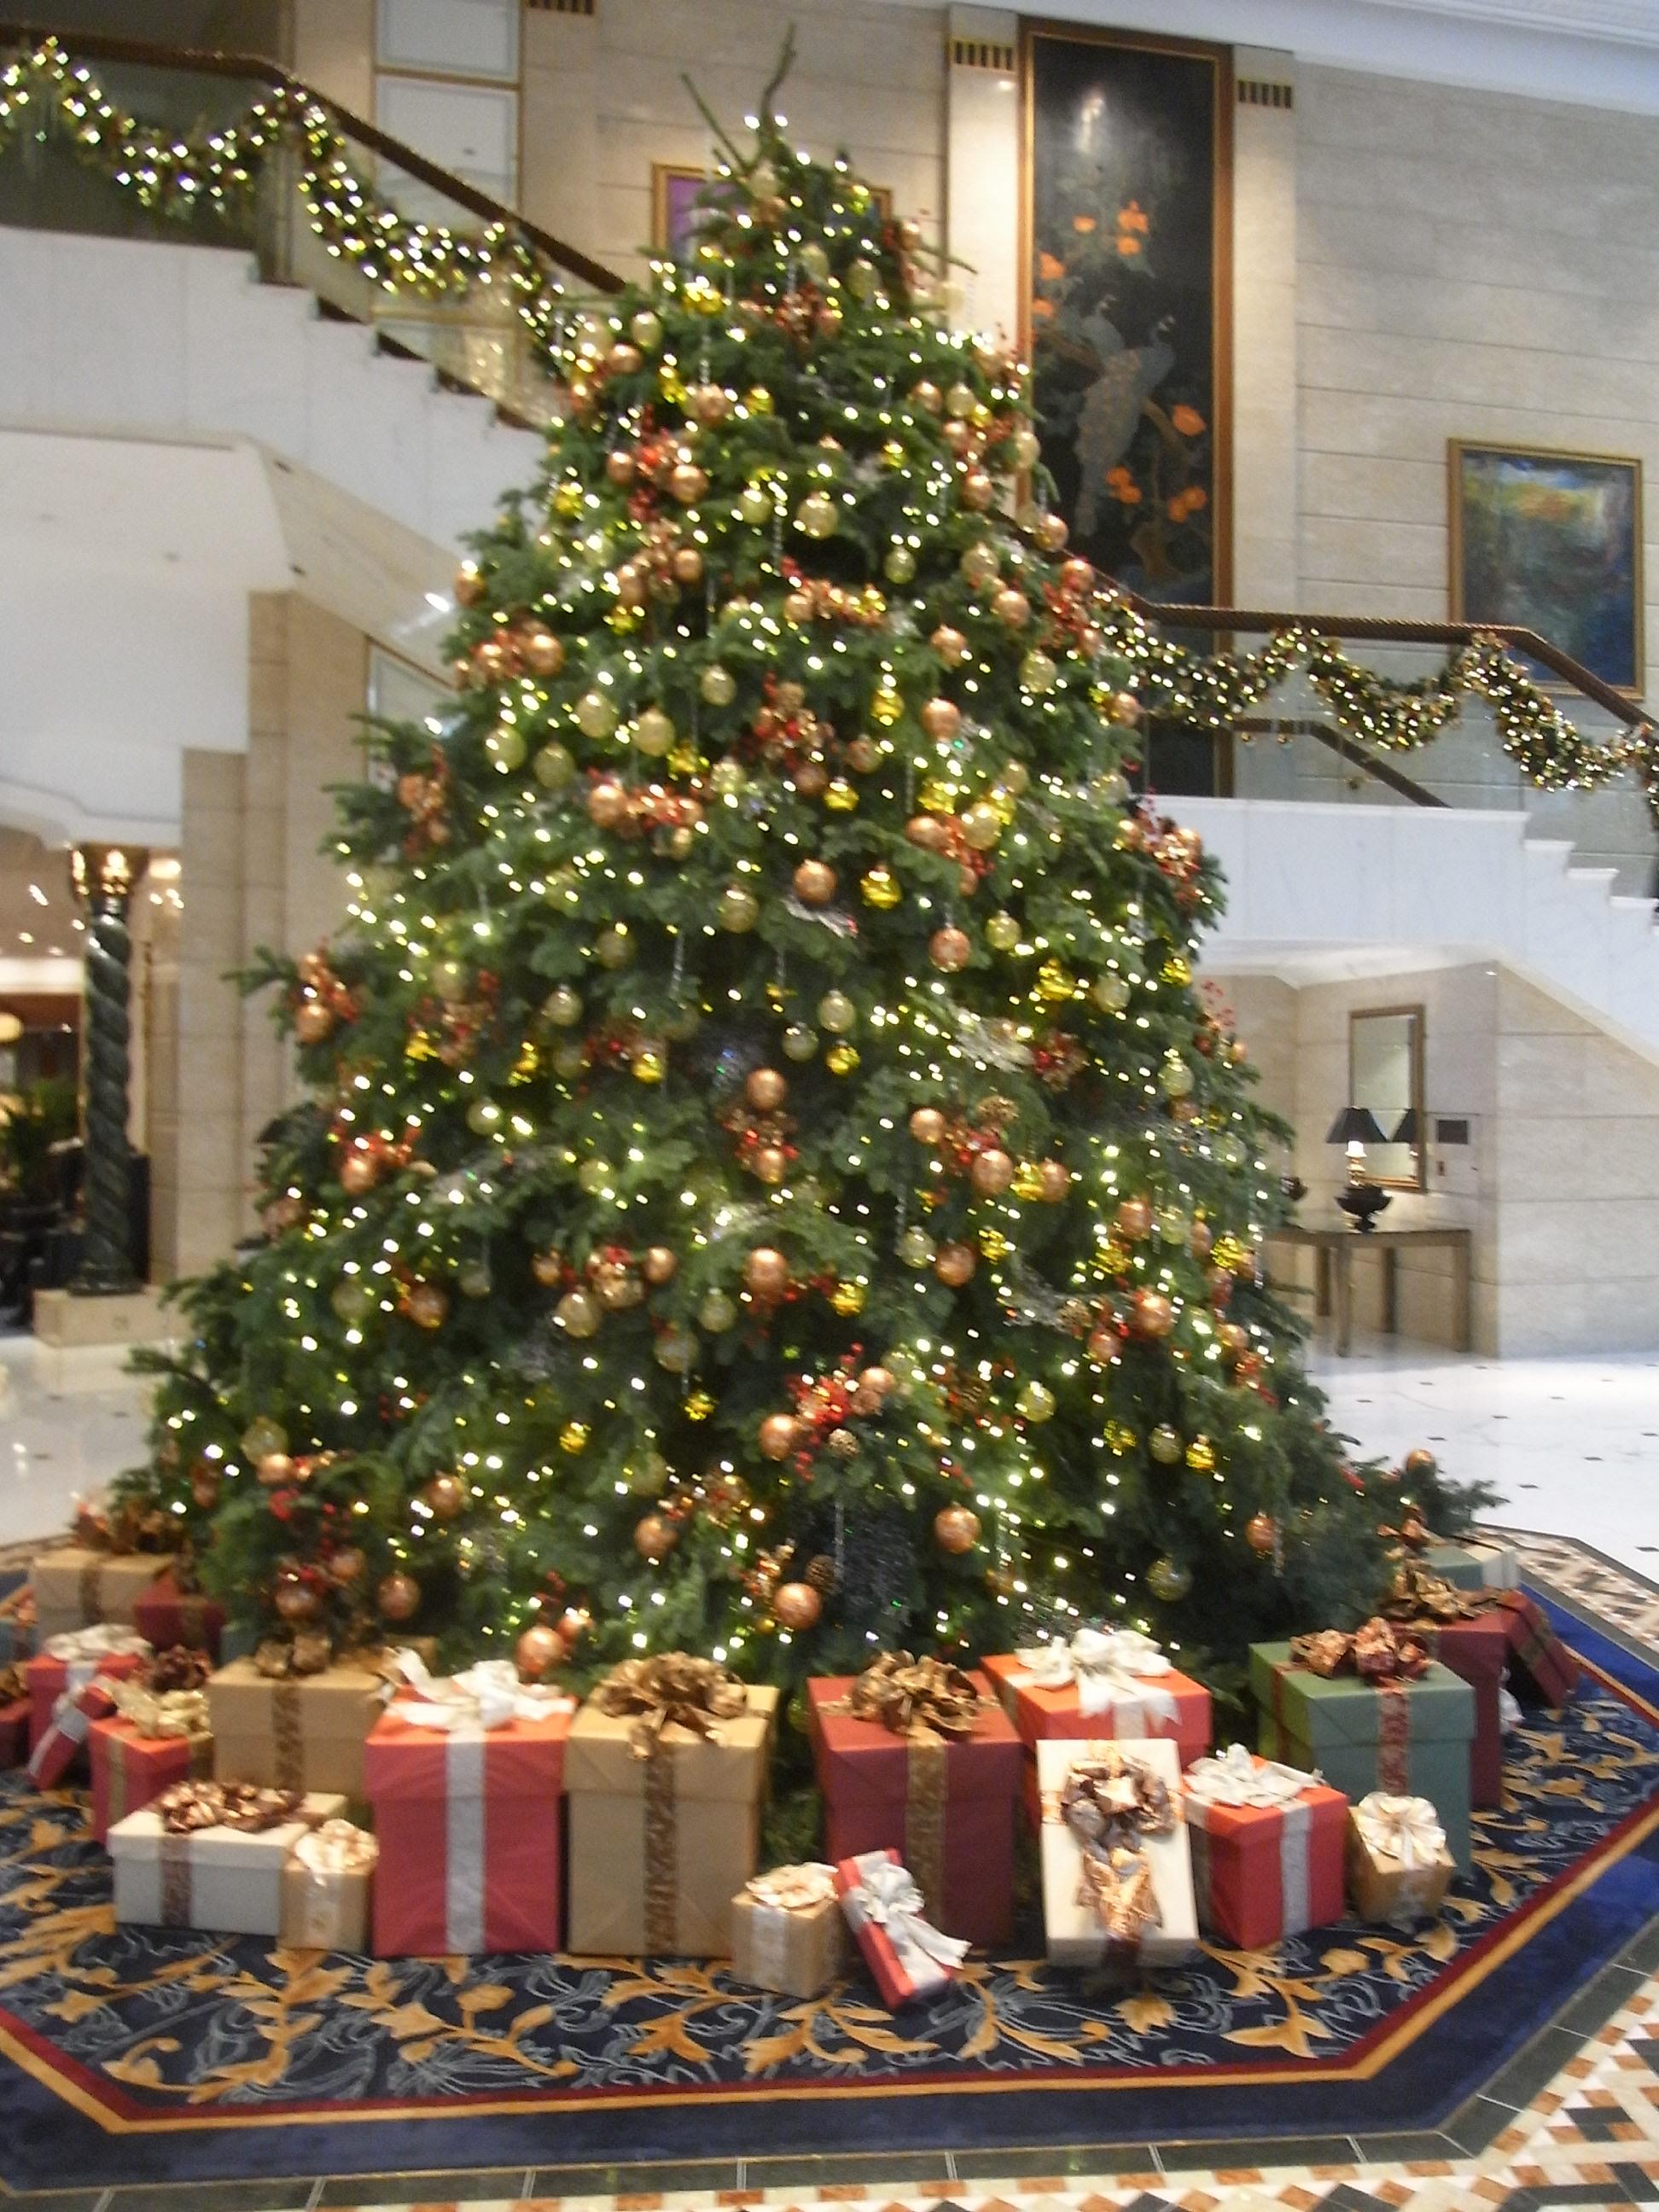 #976234 File:HK ISL Island Shangri La Hong Kong 港島香格里拉酒店 Hotel  6433 décoration noel hotel 1944x2592 px @ aertt.com